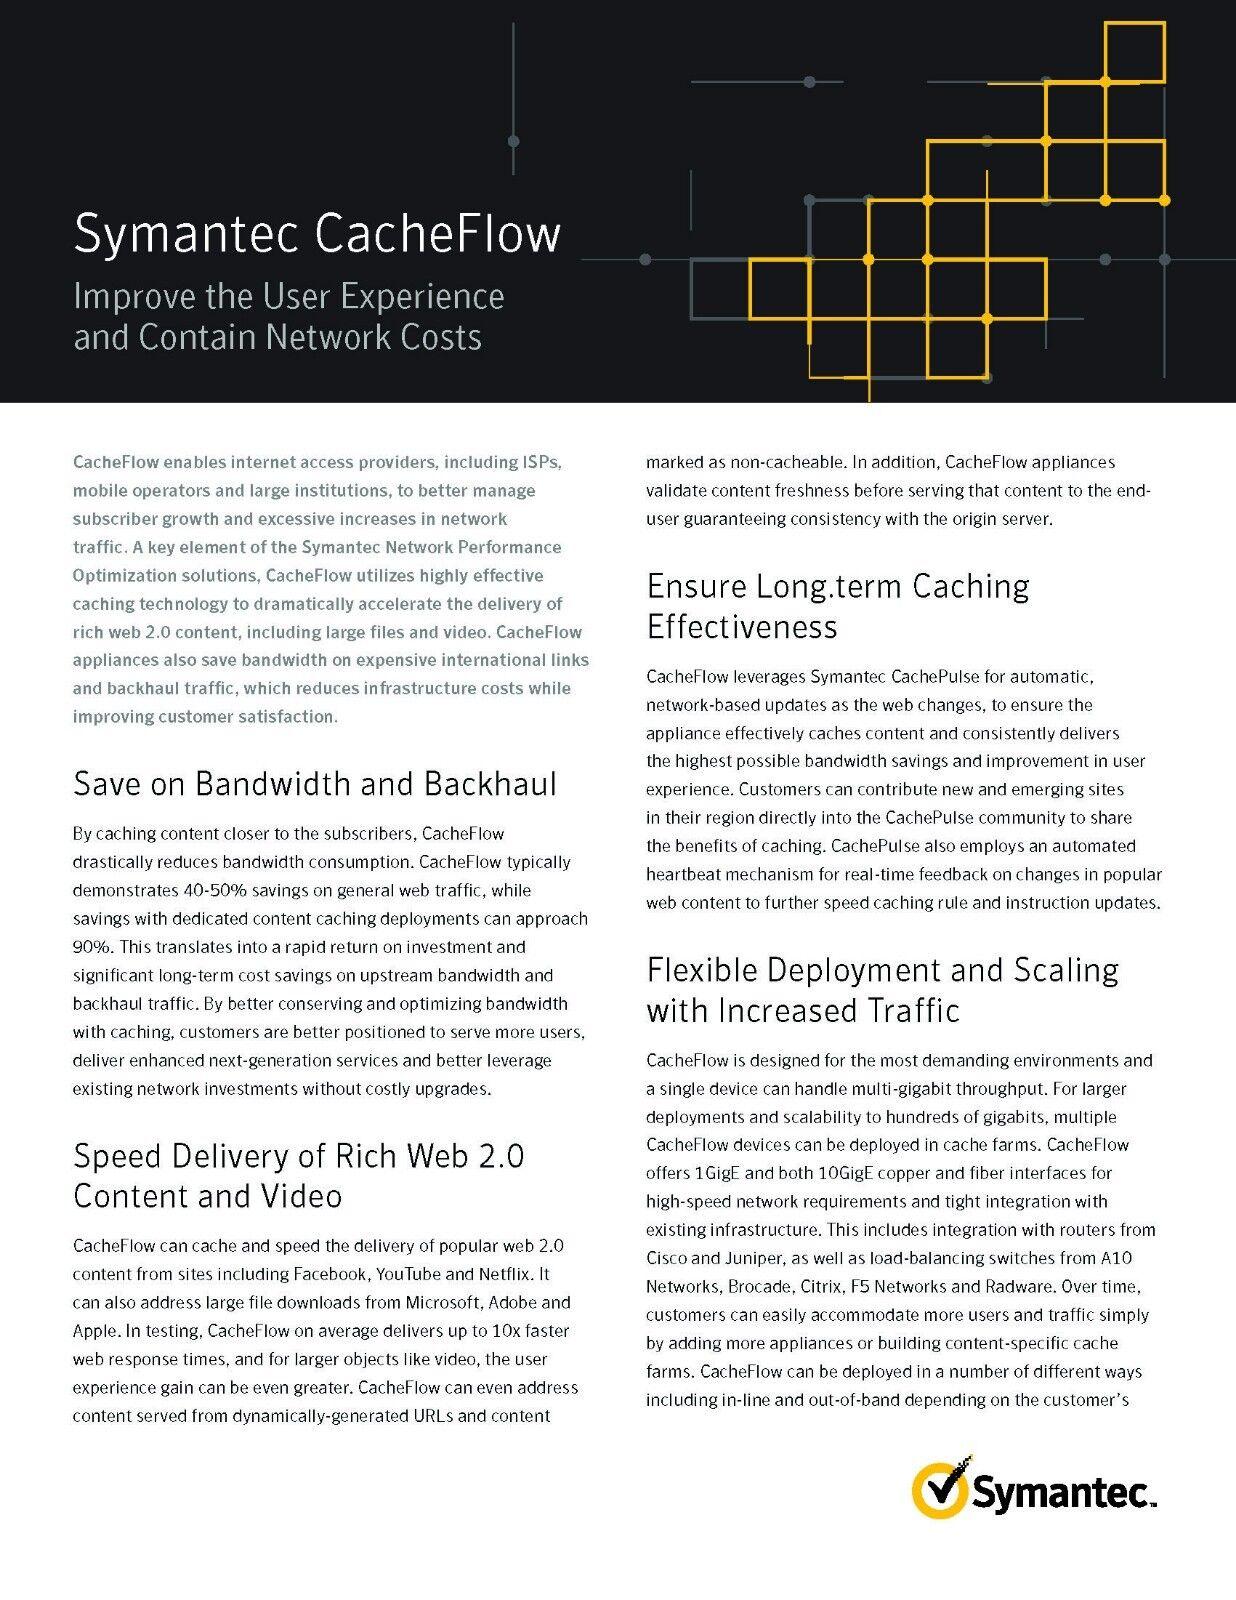 Symantec Blue Coat CacheFlow CF500MX Appliance 5000 Series Load Balancing  Device